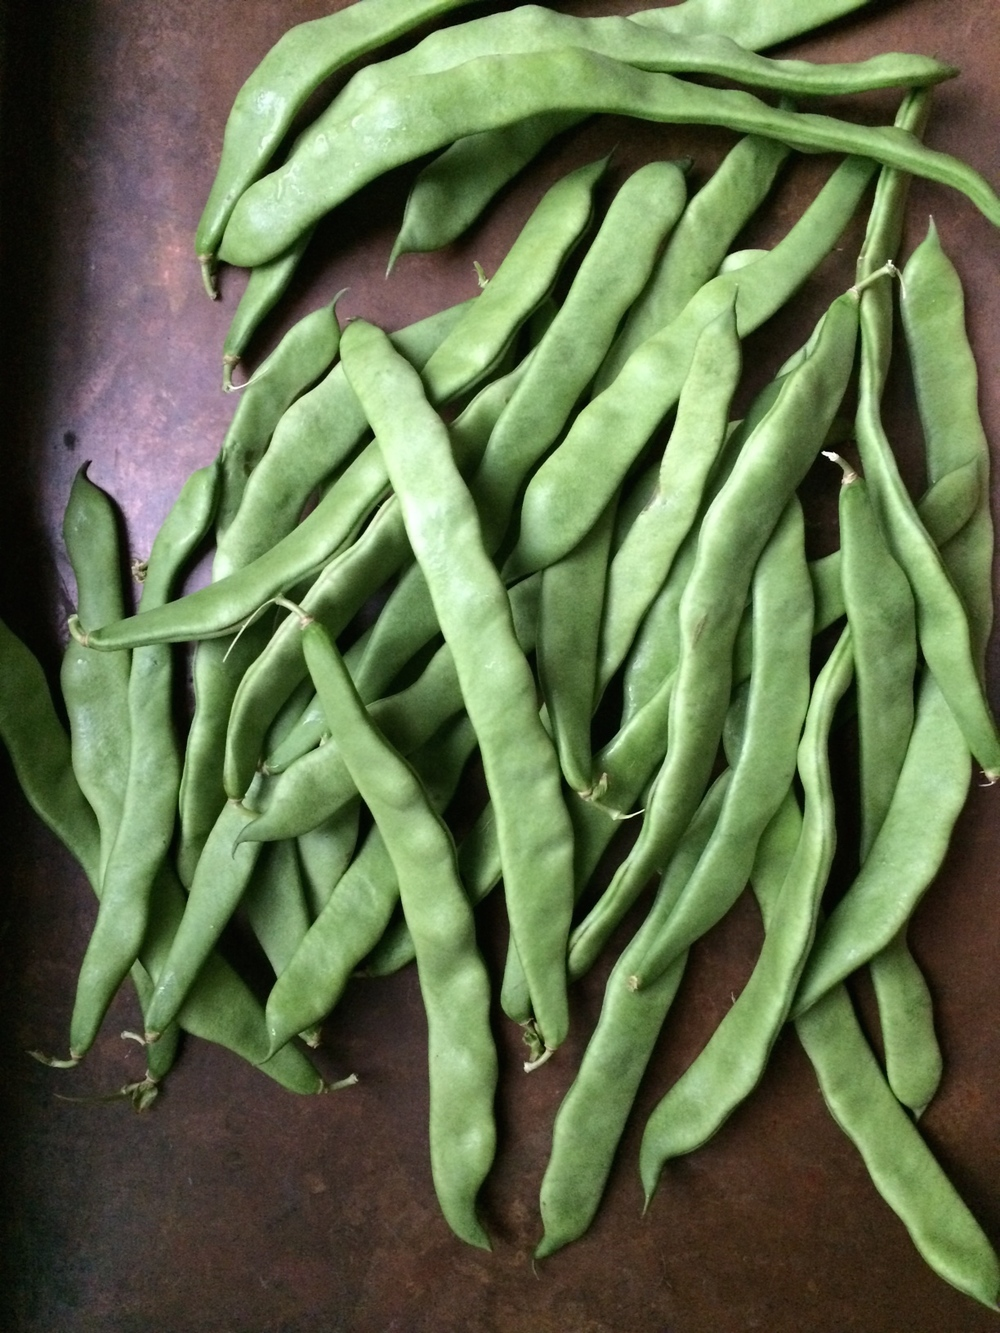 Northeaster pole beans